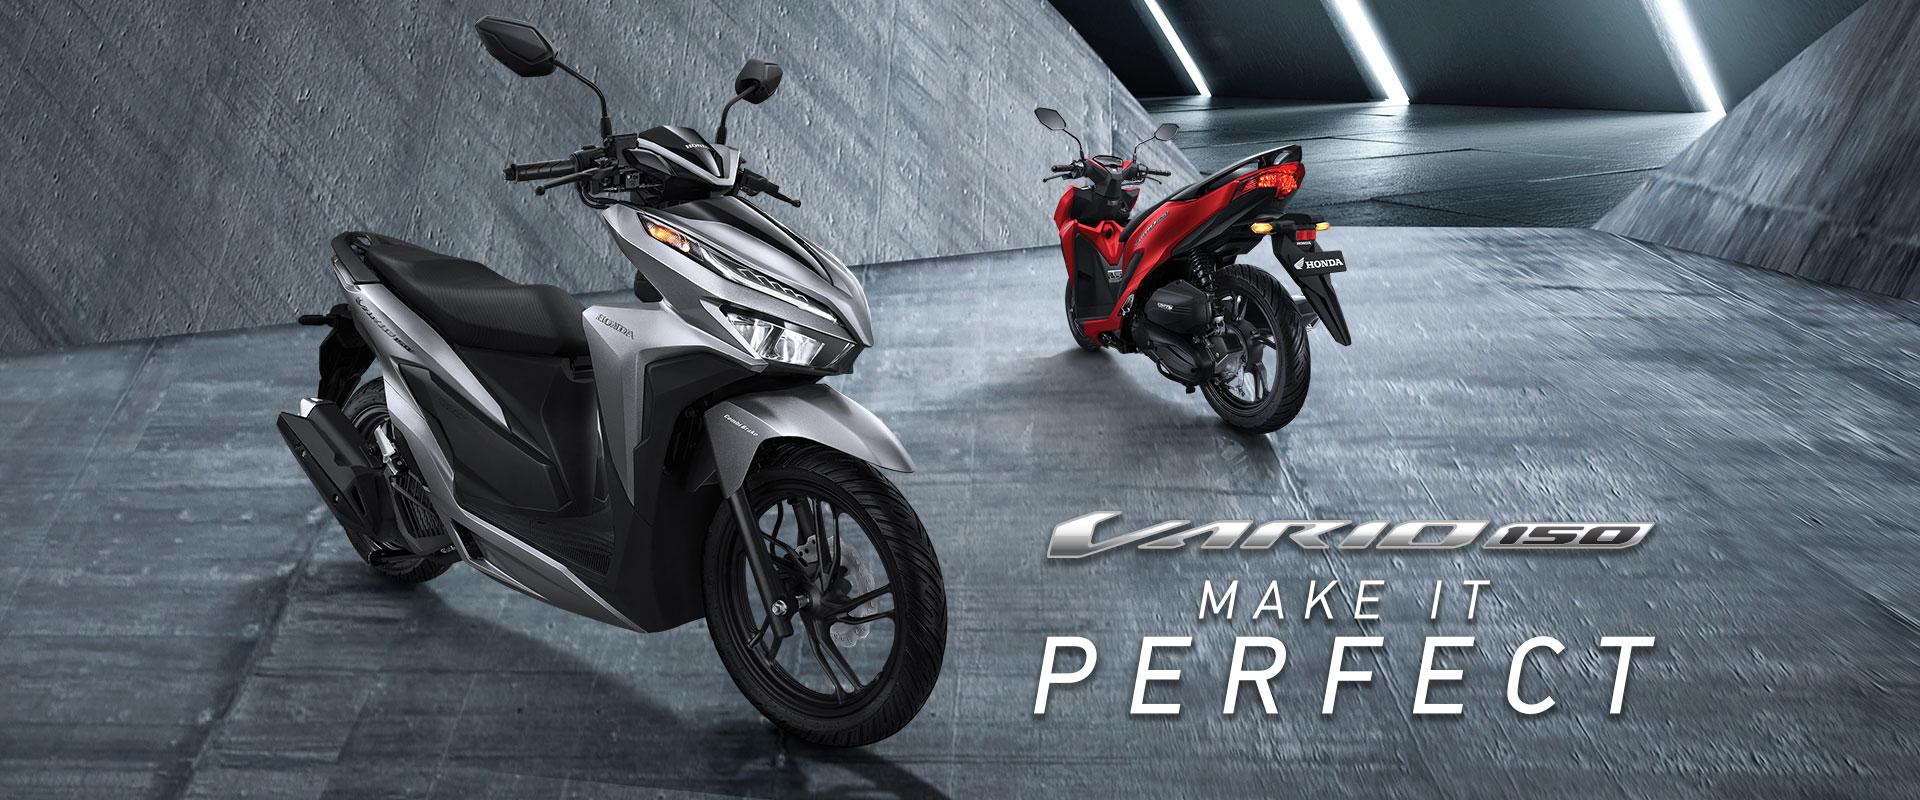 Rp 23340000 Harga Honda Vario 150 2018 Jawa Tengah Rtbwebid